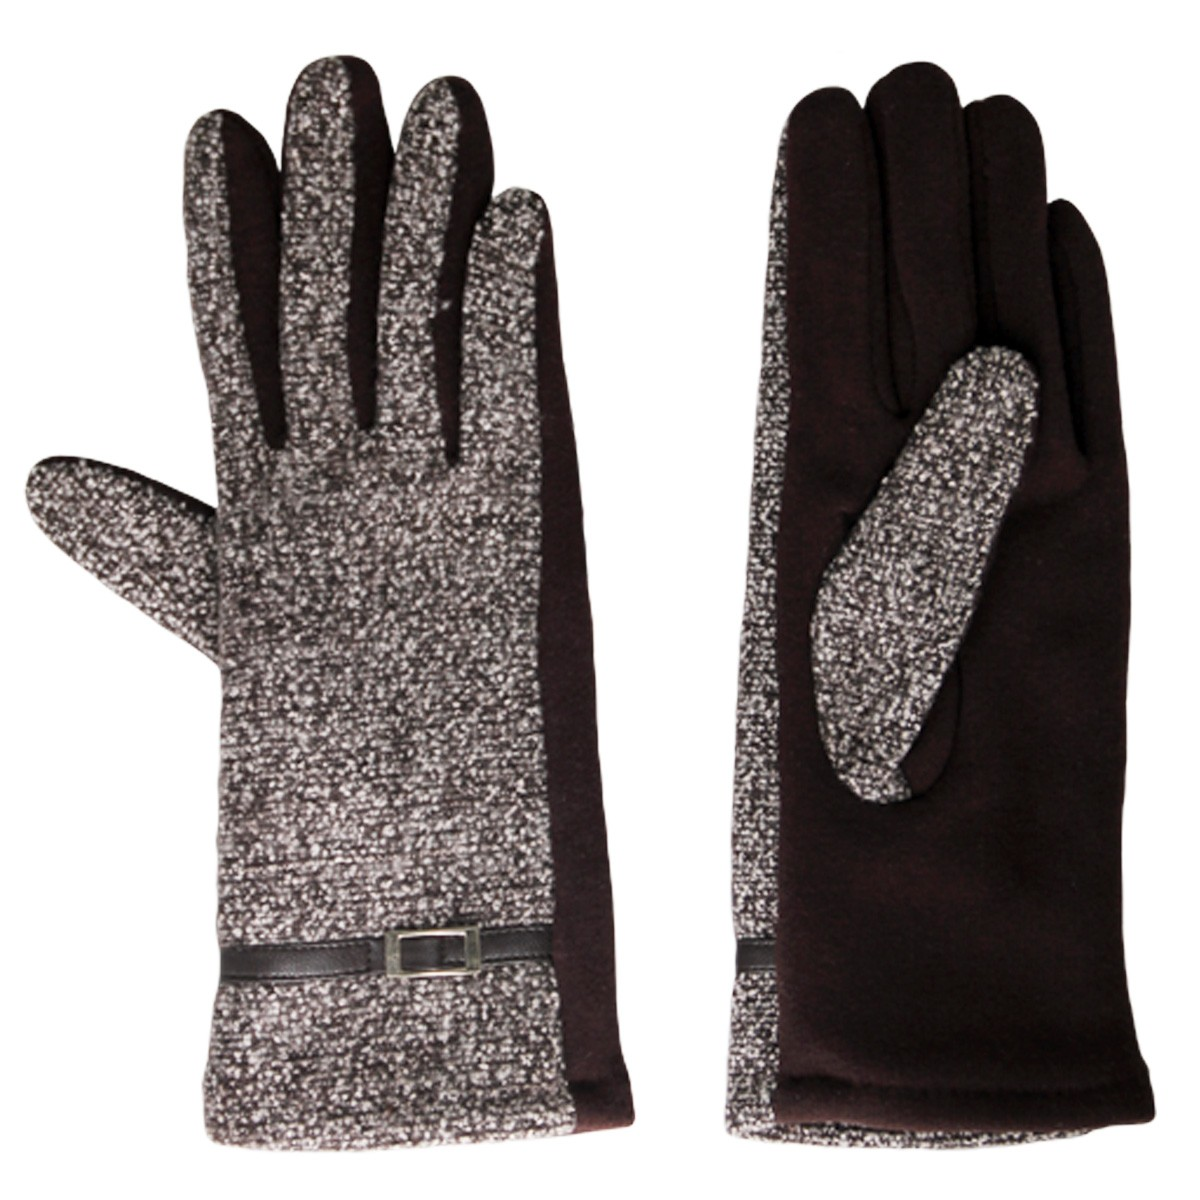 Handschuhe Stoff braun